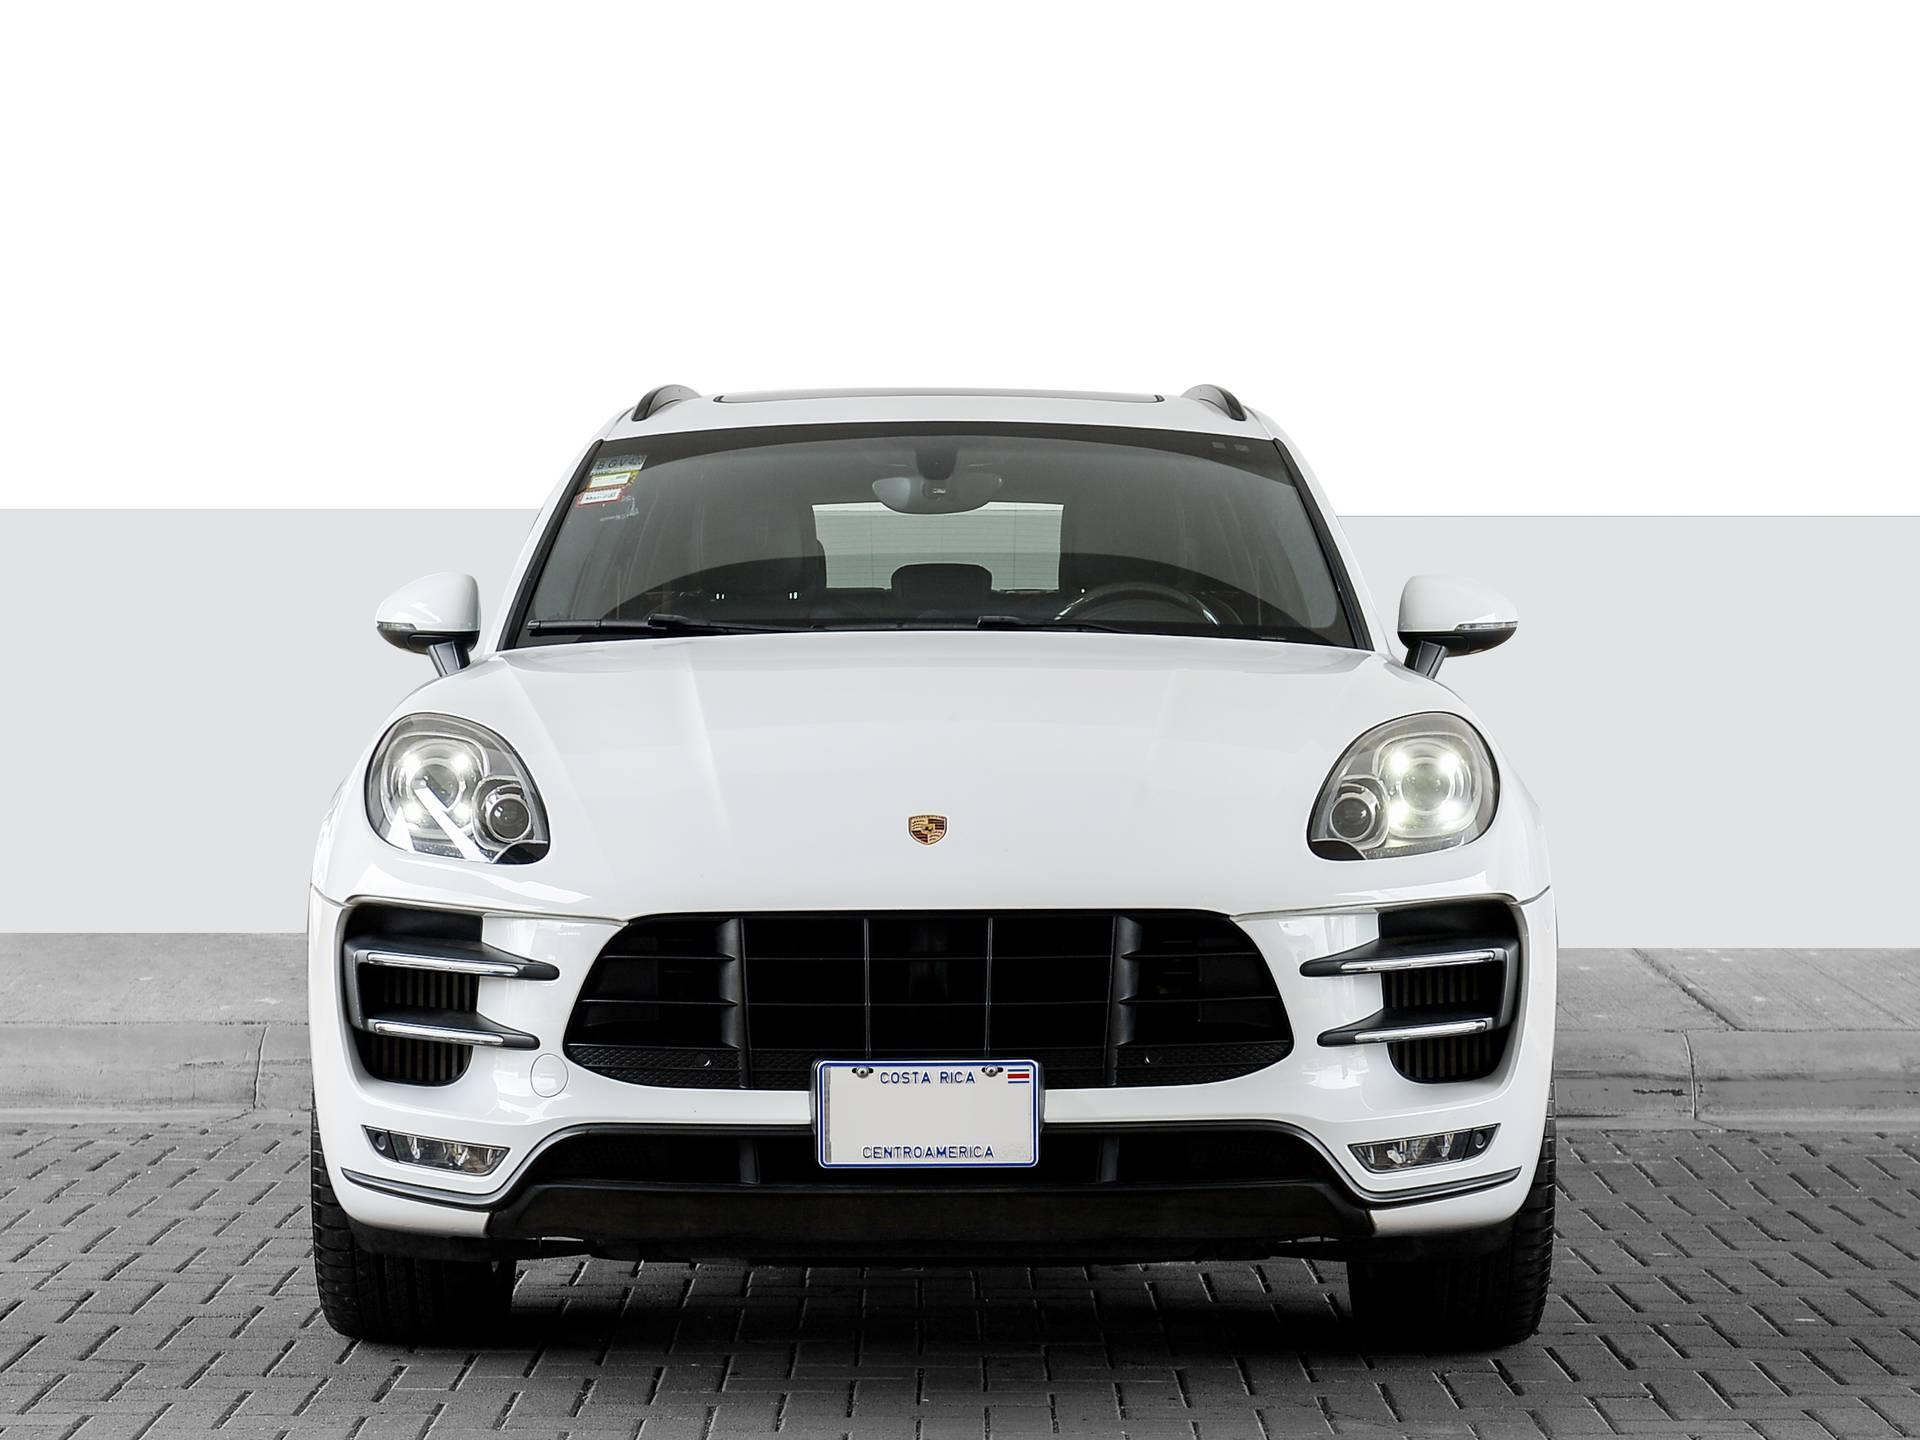 2015 Porsche Macan Turbo – 2